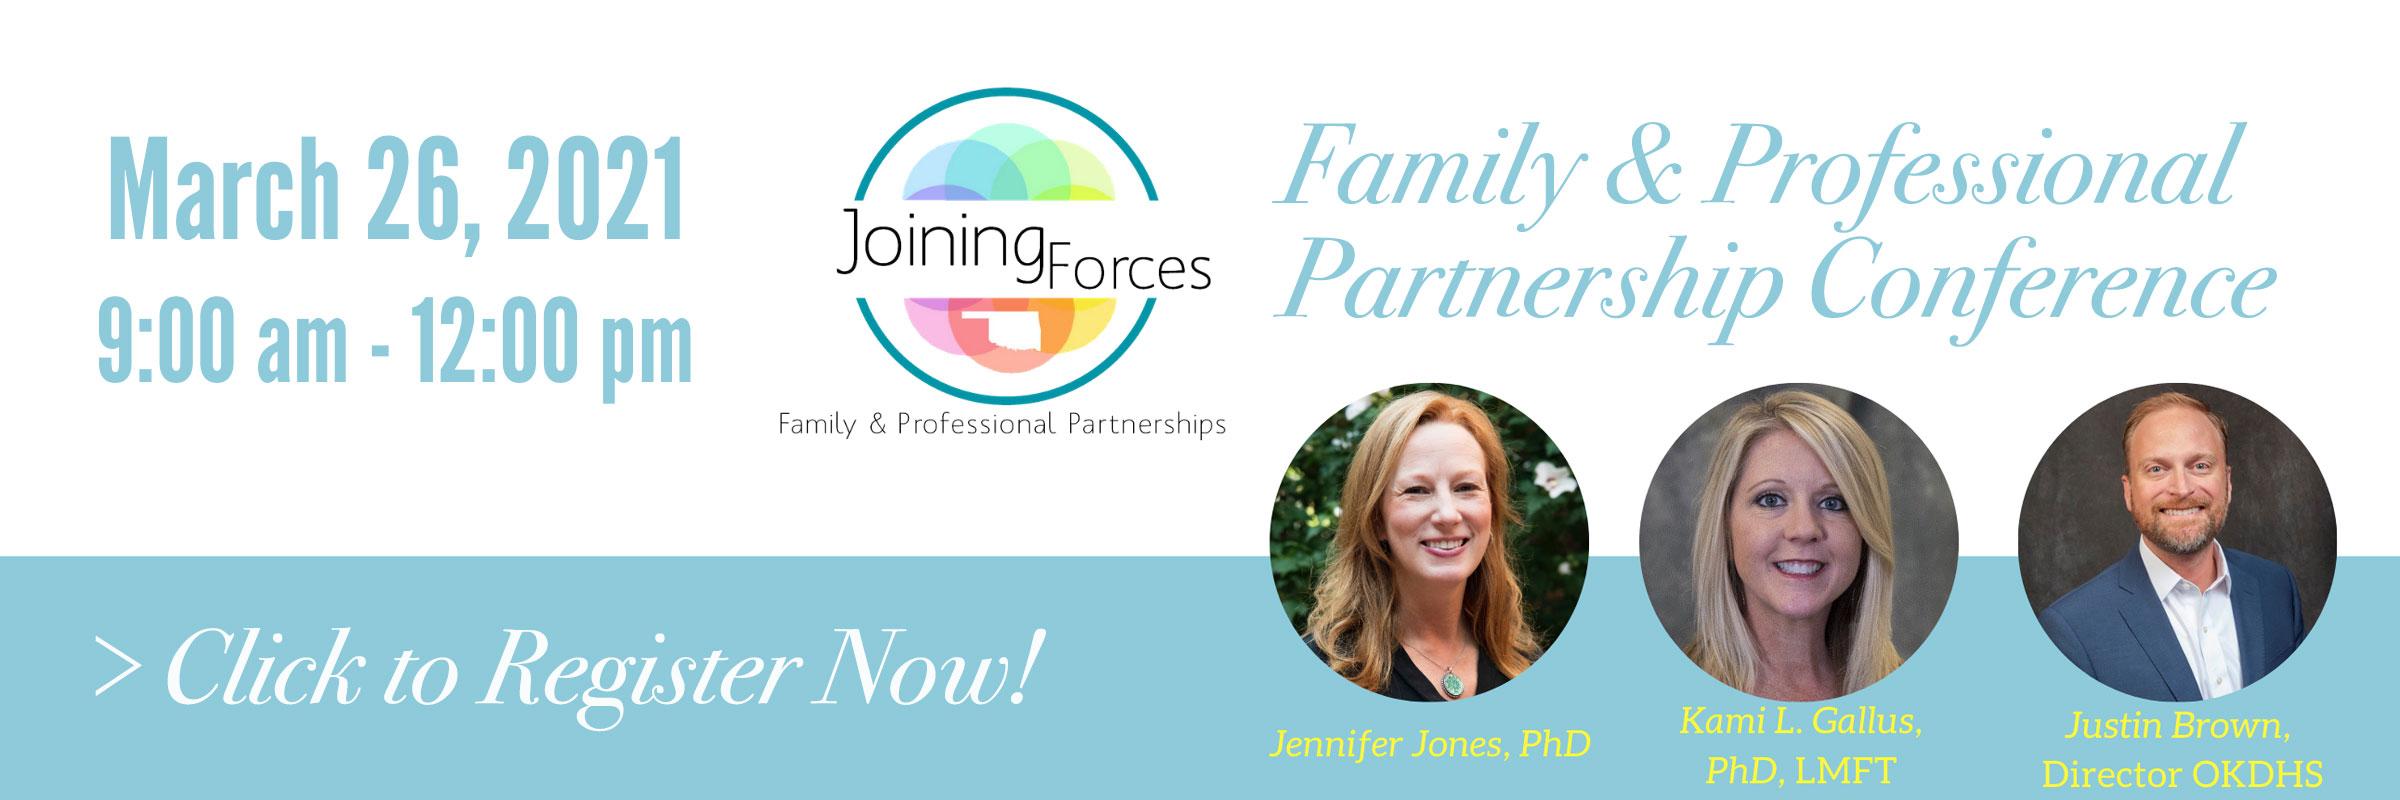 JoiningForces2021